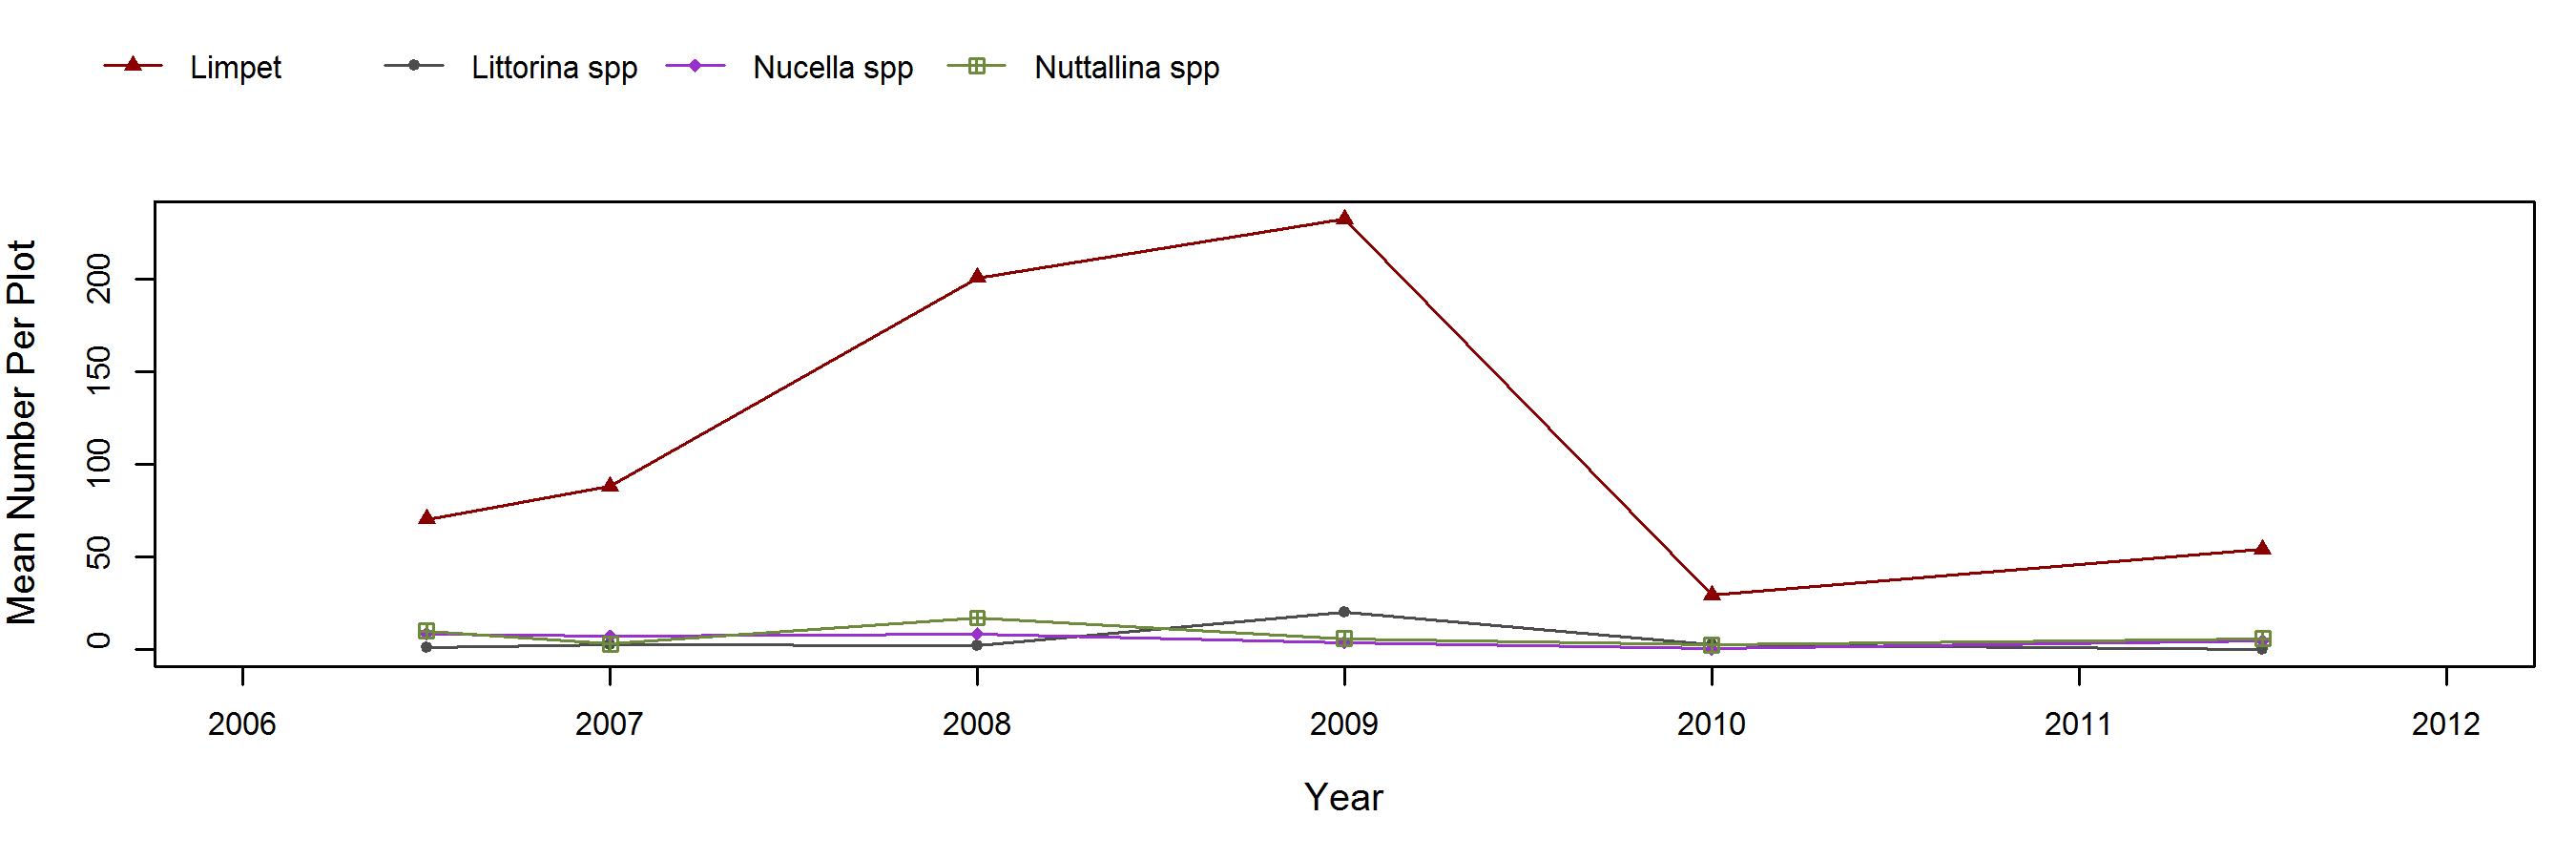 Trailer Mytilus trend plot